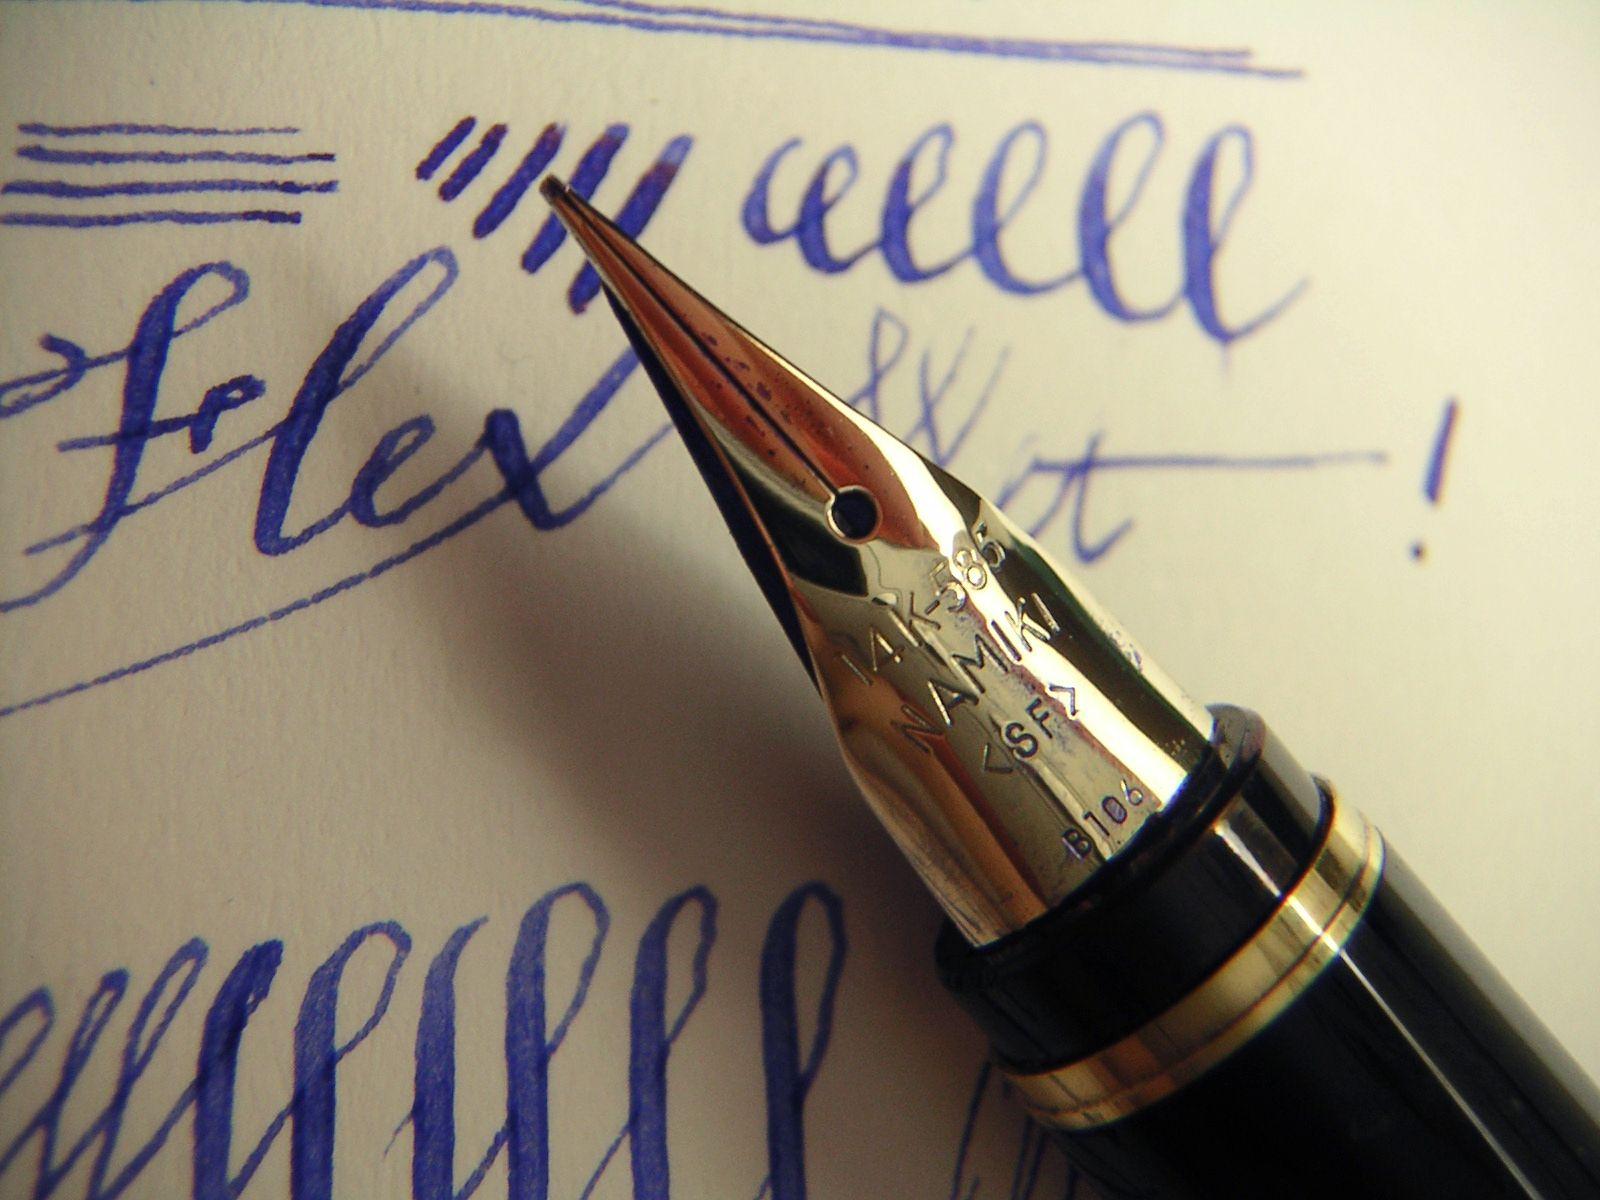 Pilot Namiki Falcon Fountain Pen Flex Nib